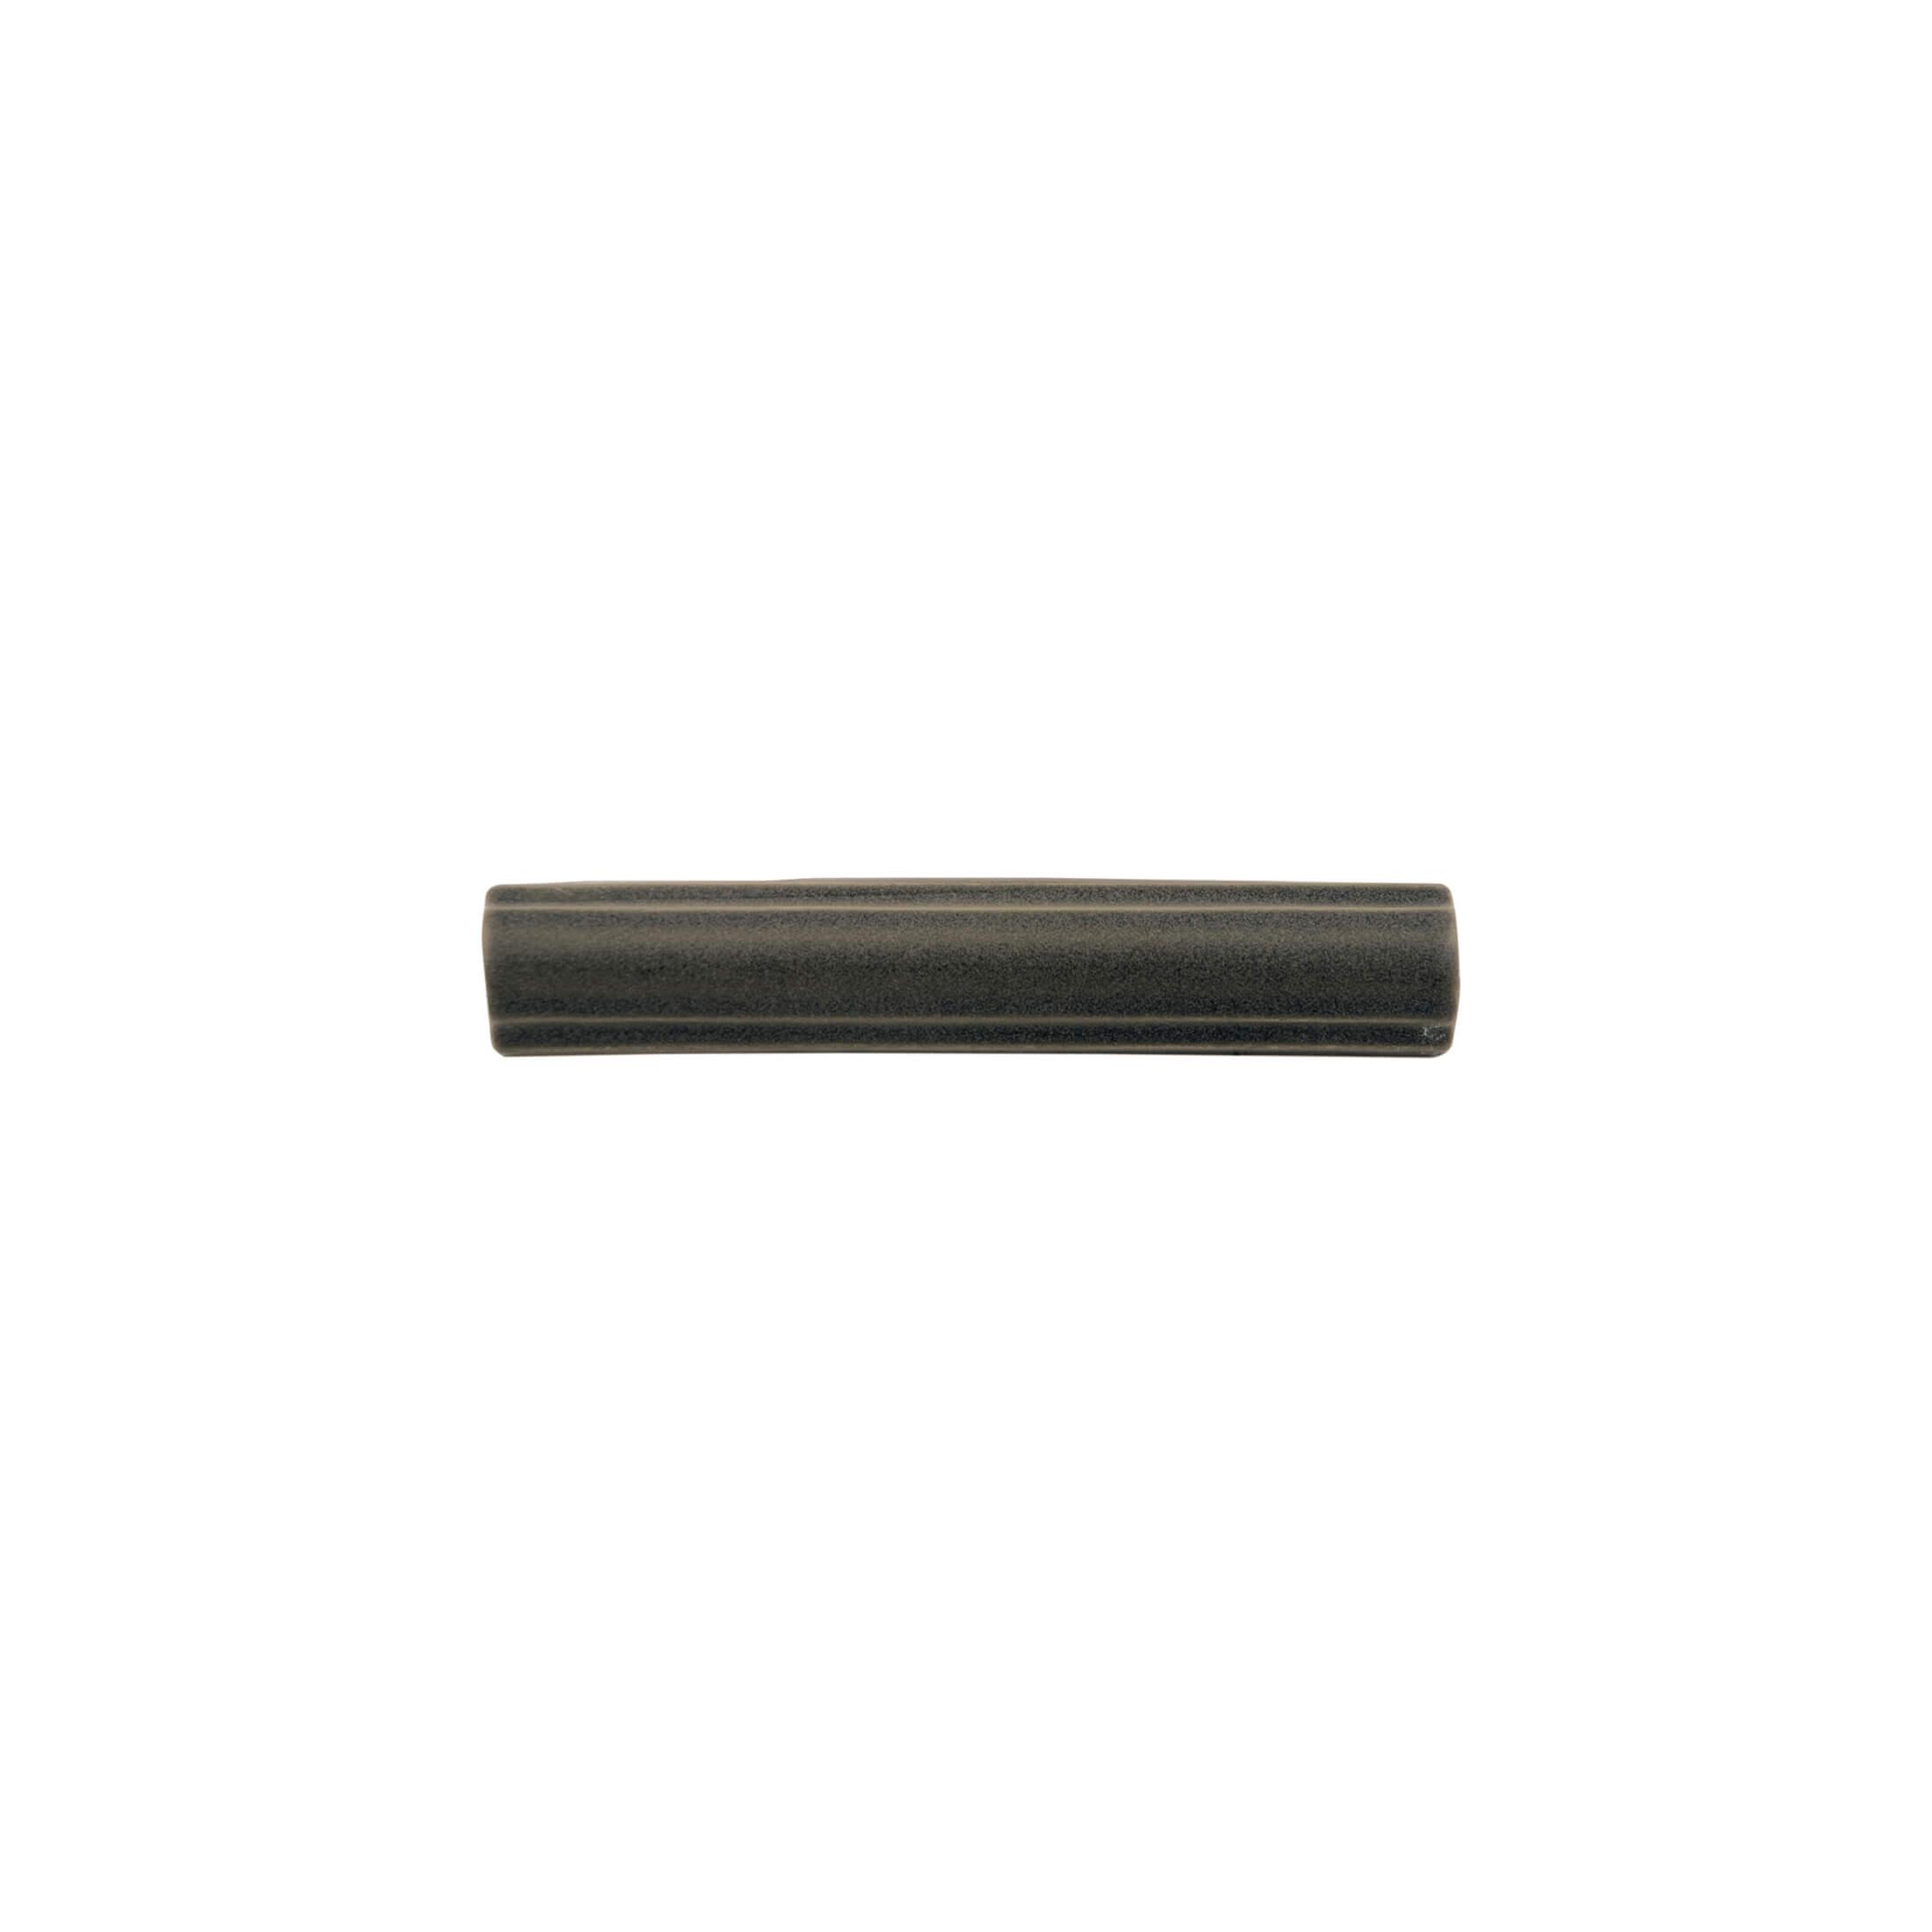 ADNT5006 - BARRA RELIEVE - 2.5 cm X 15 cm